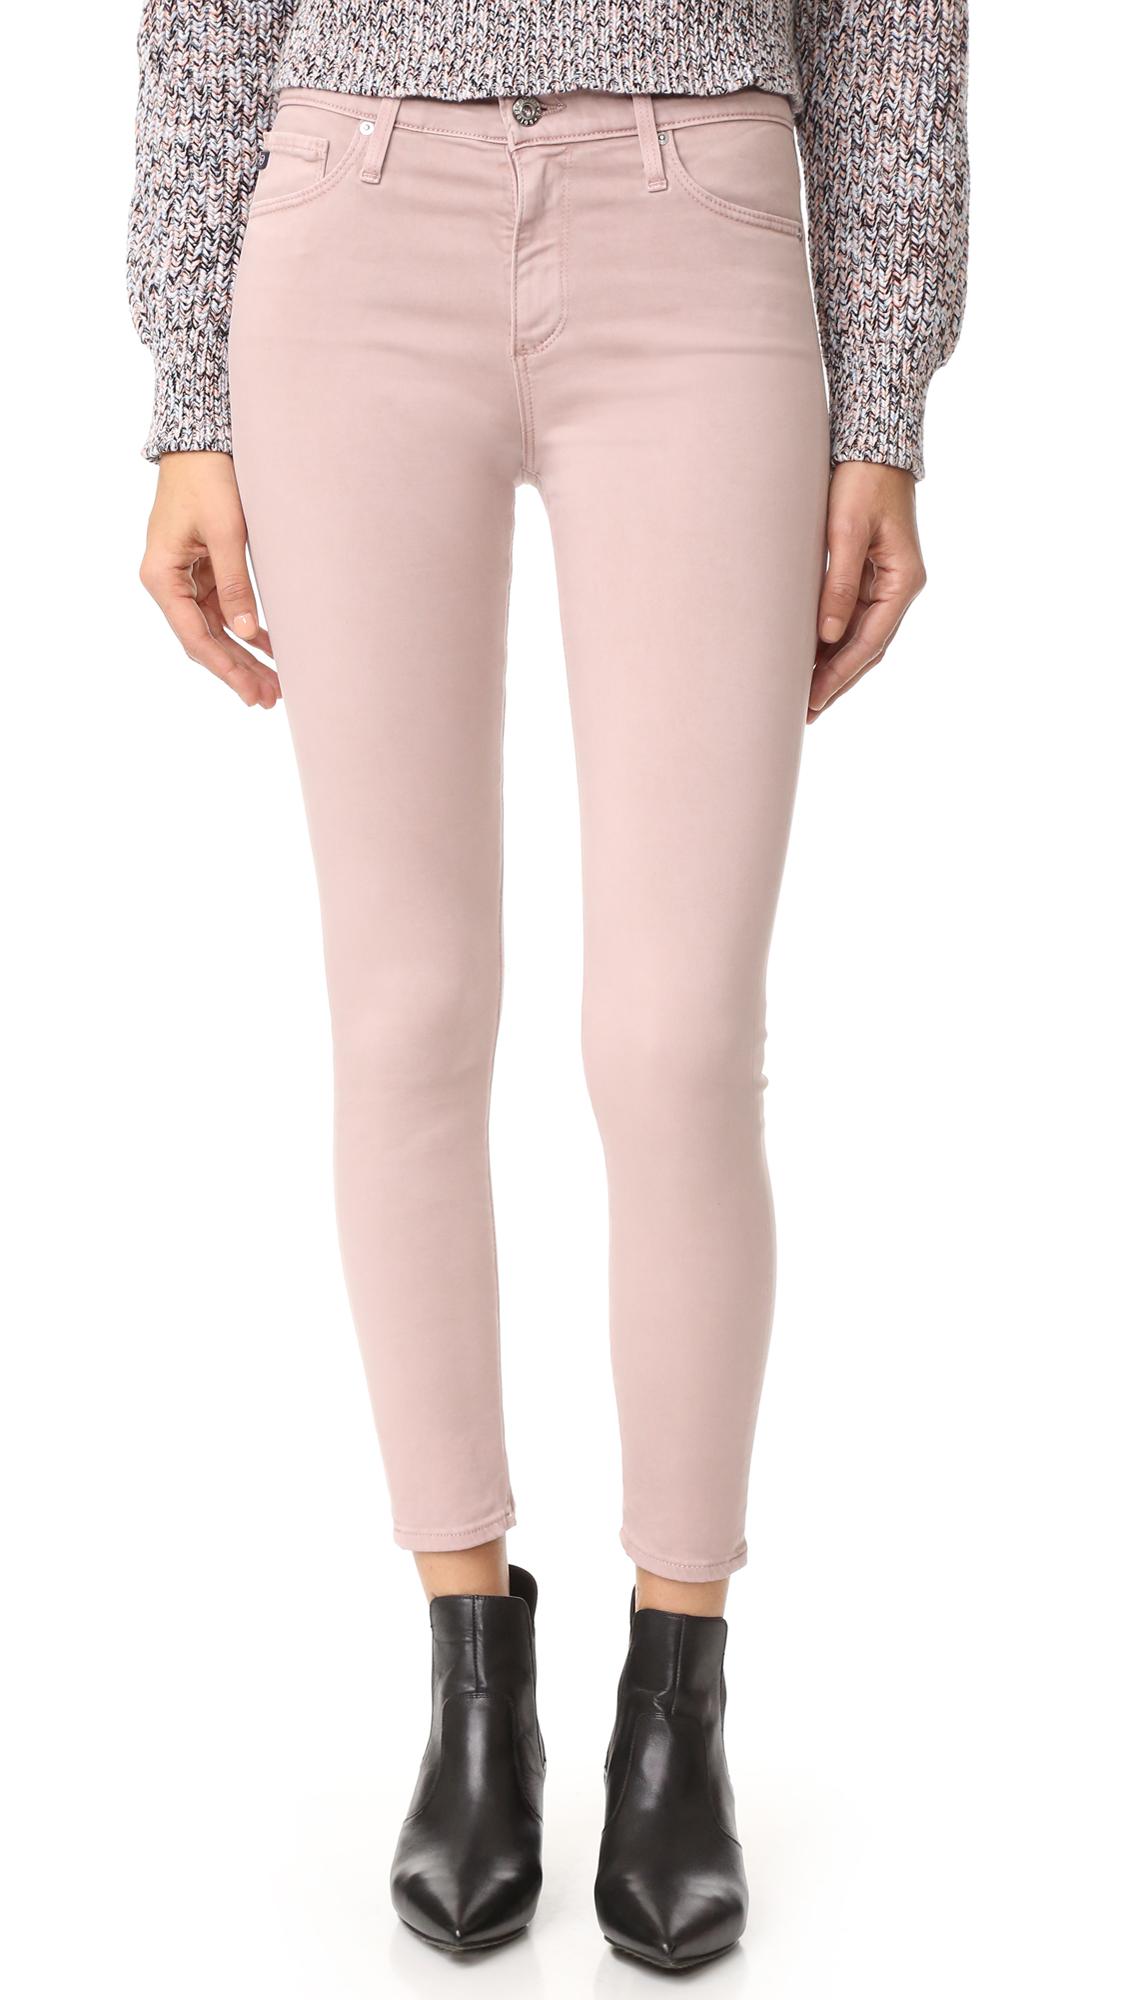 The Farrah Skinny Crop Jeans